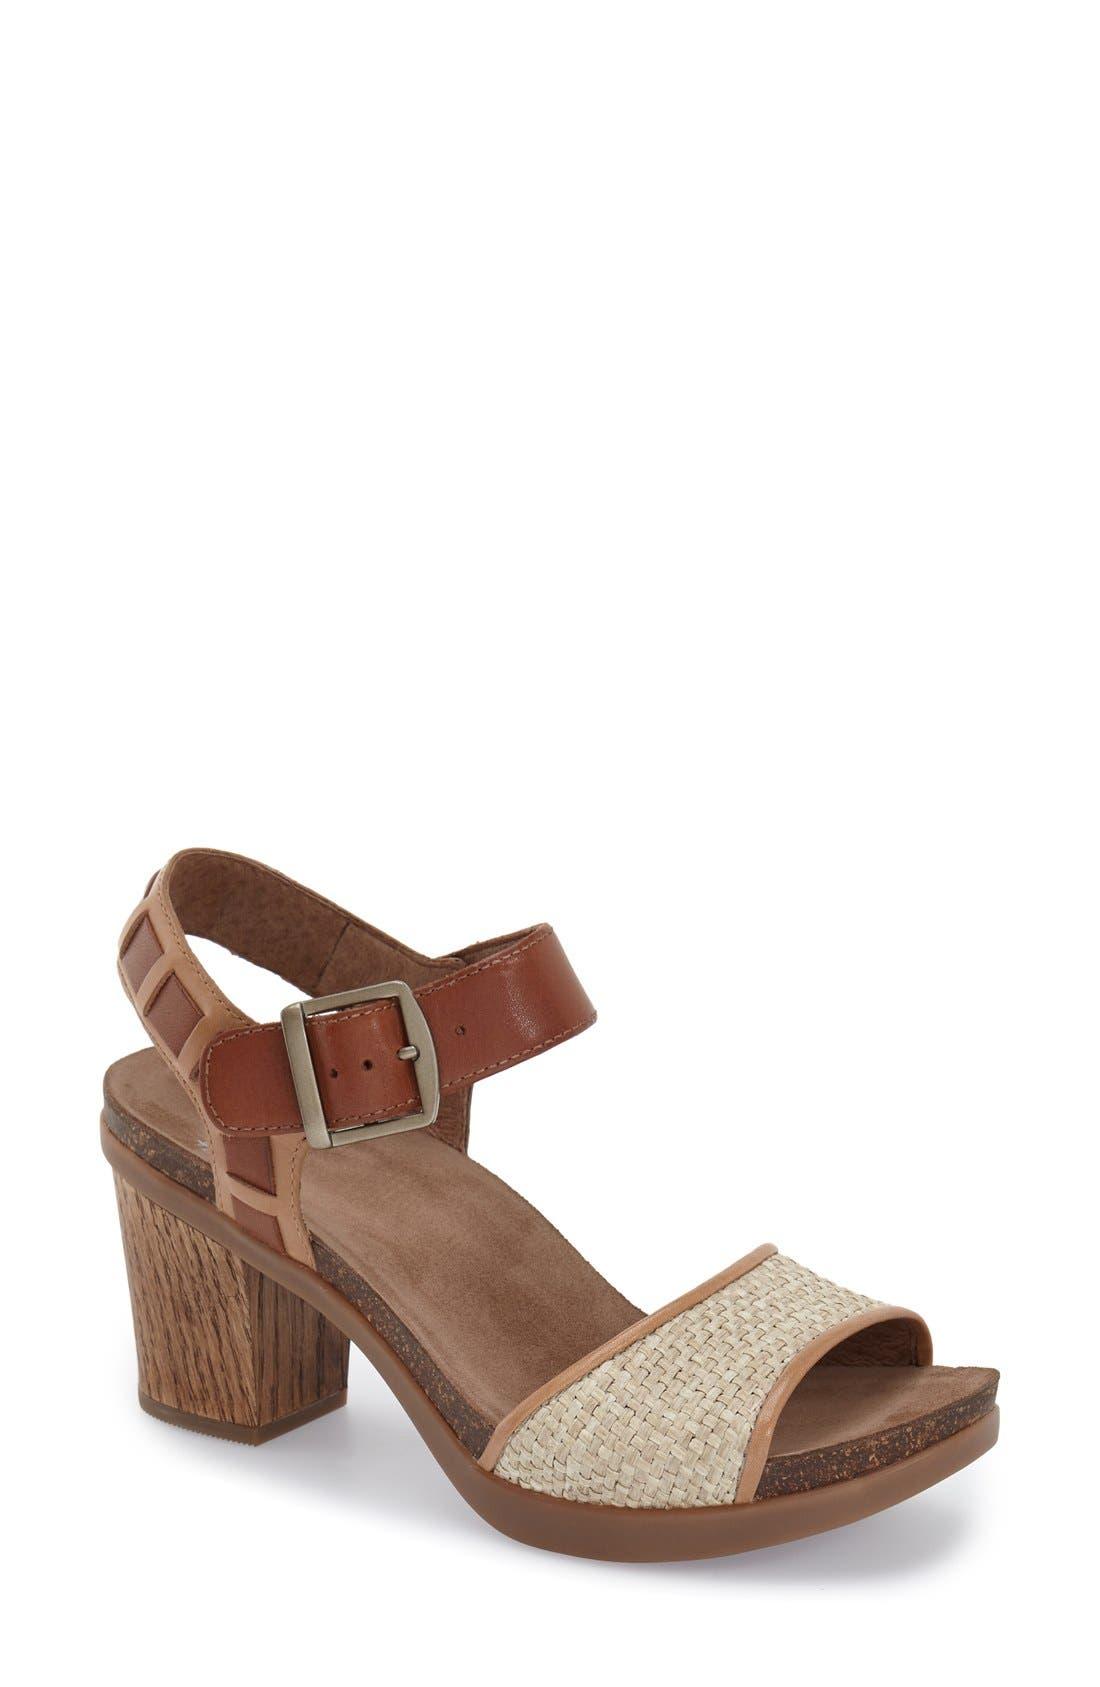 DANSKO 'Debby' Platform Sandal